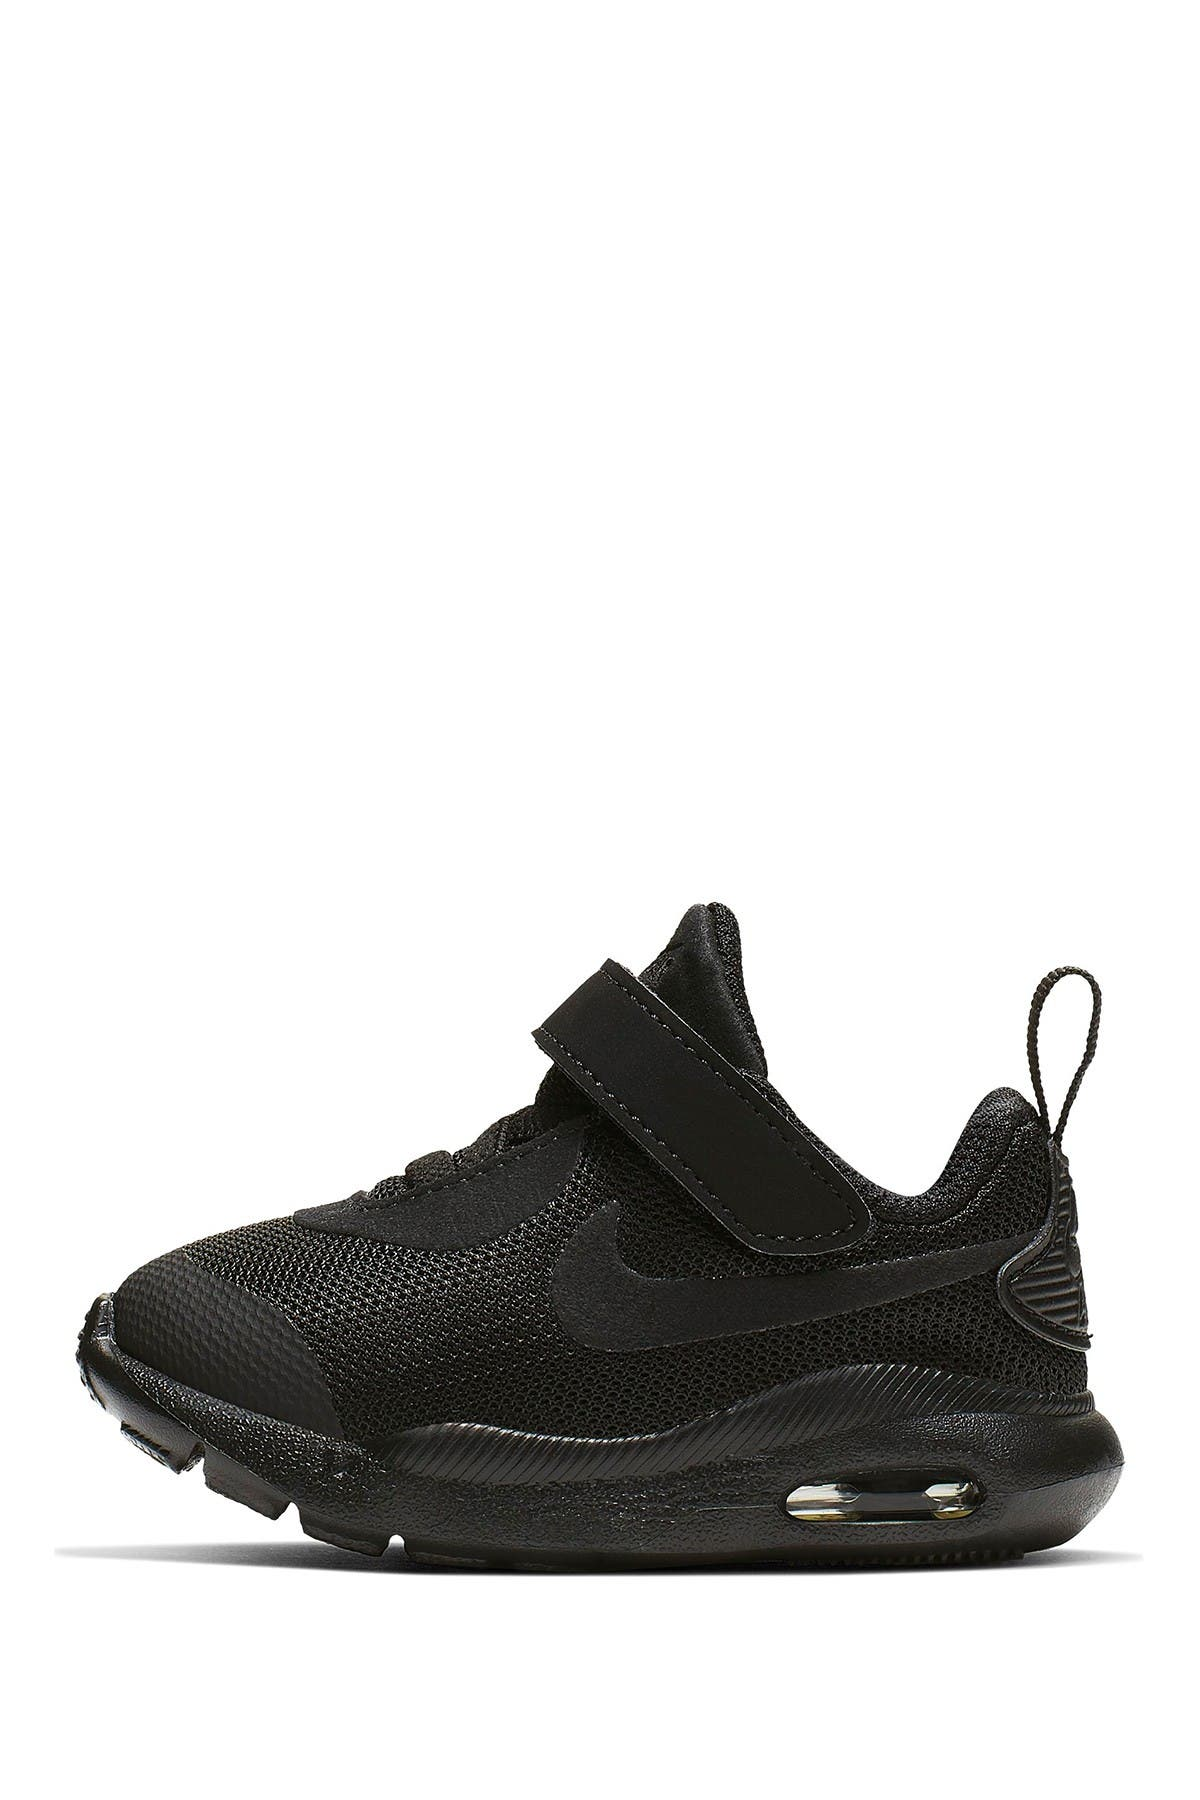 Image of Nike Air Max Oketo Sneaker